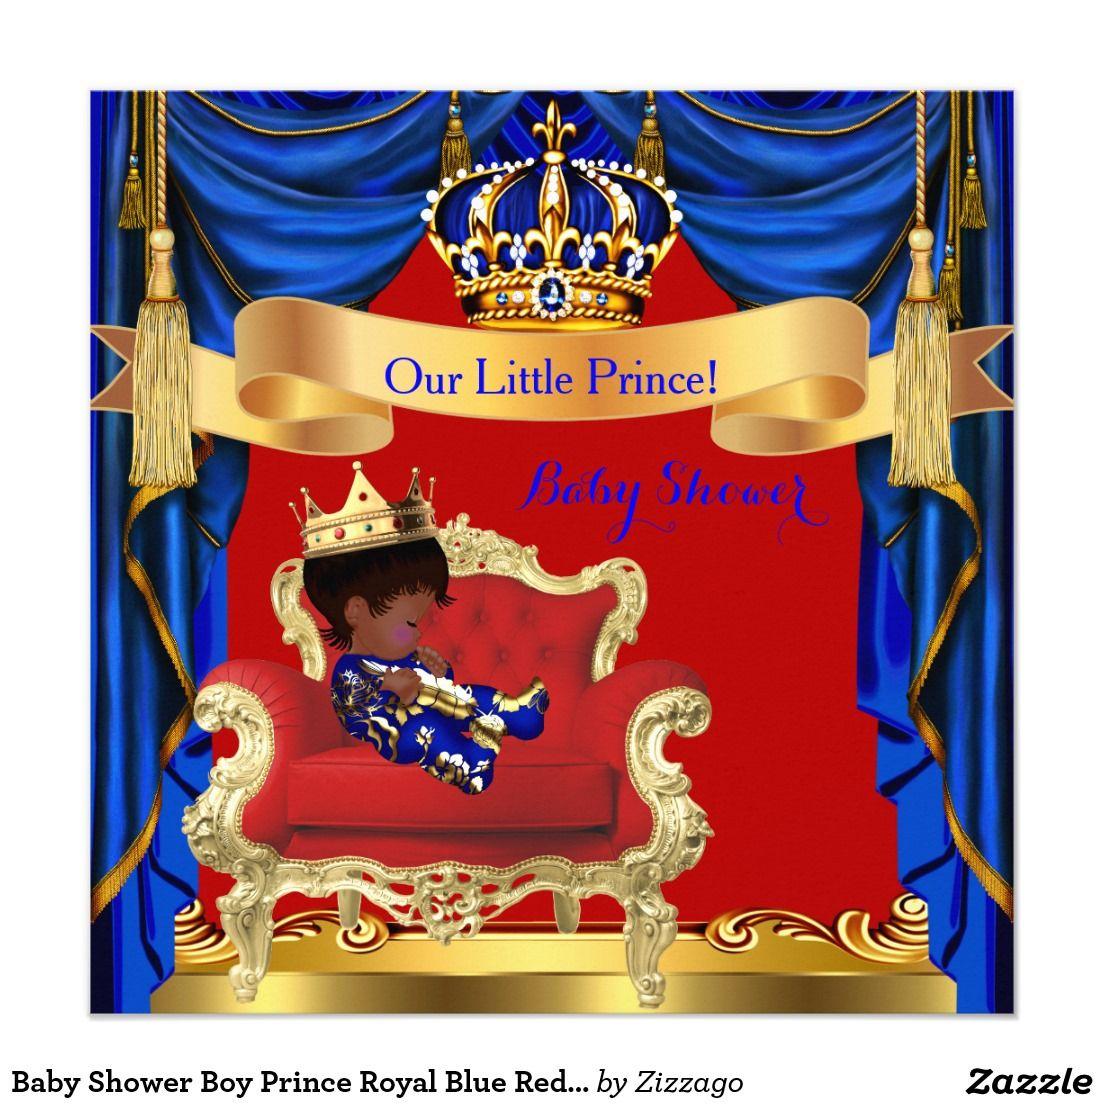 Baby Shower Boy Prince Royal Blue Red Ethnic Invitation   jelanie ...